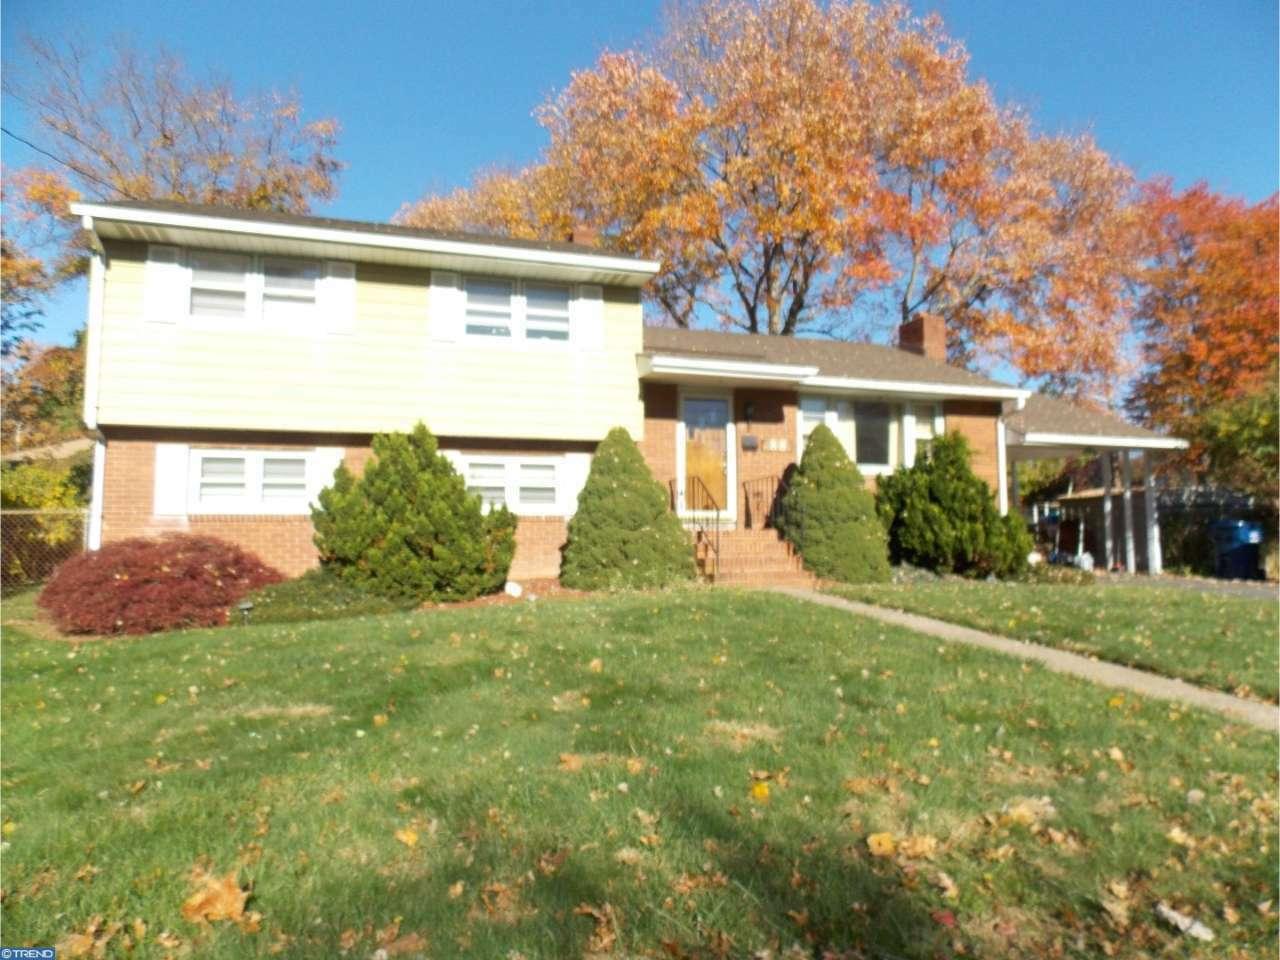 88 Darrah Ln, Lawrence, NJ - USA (photo 1)